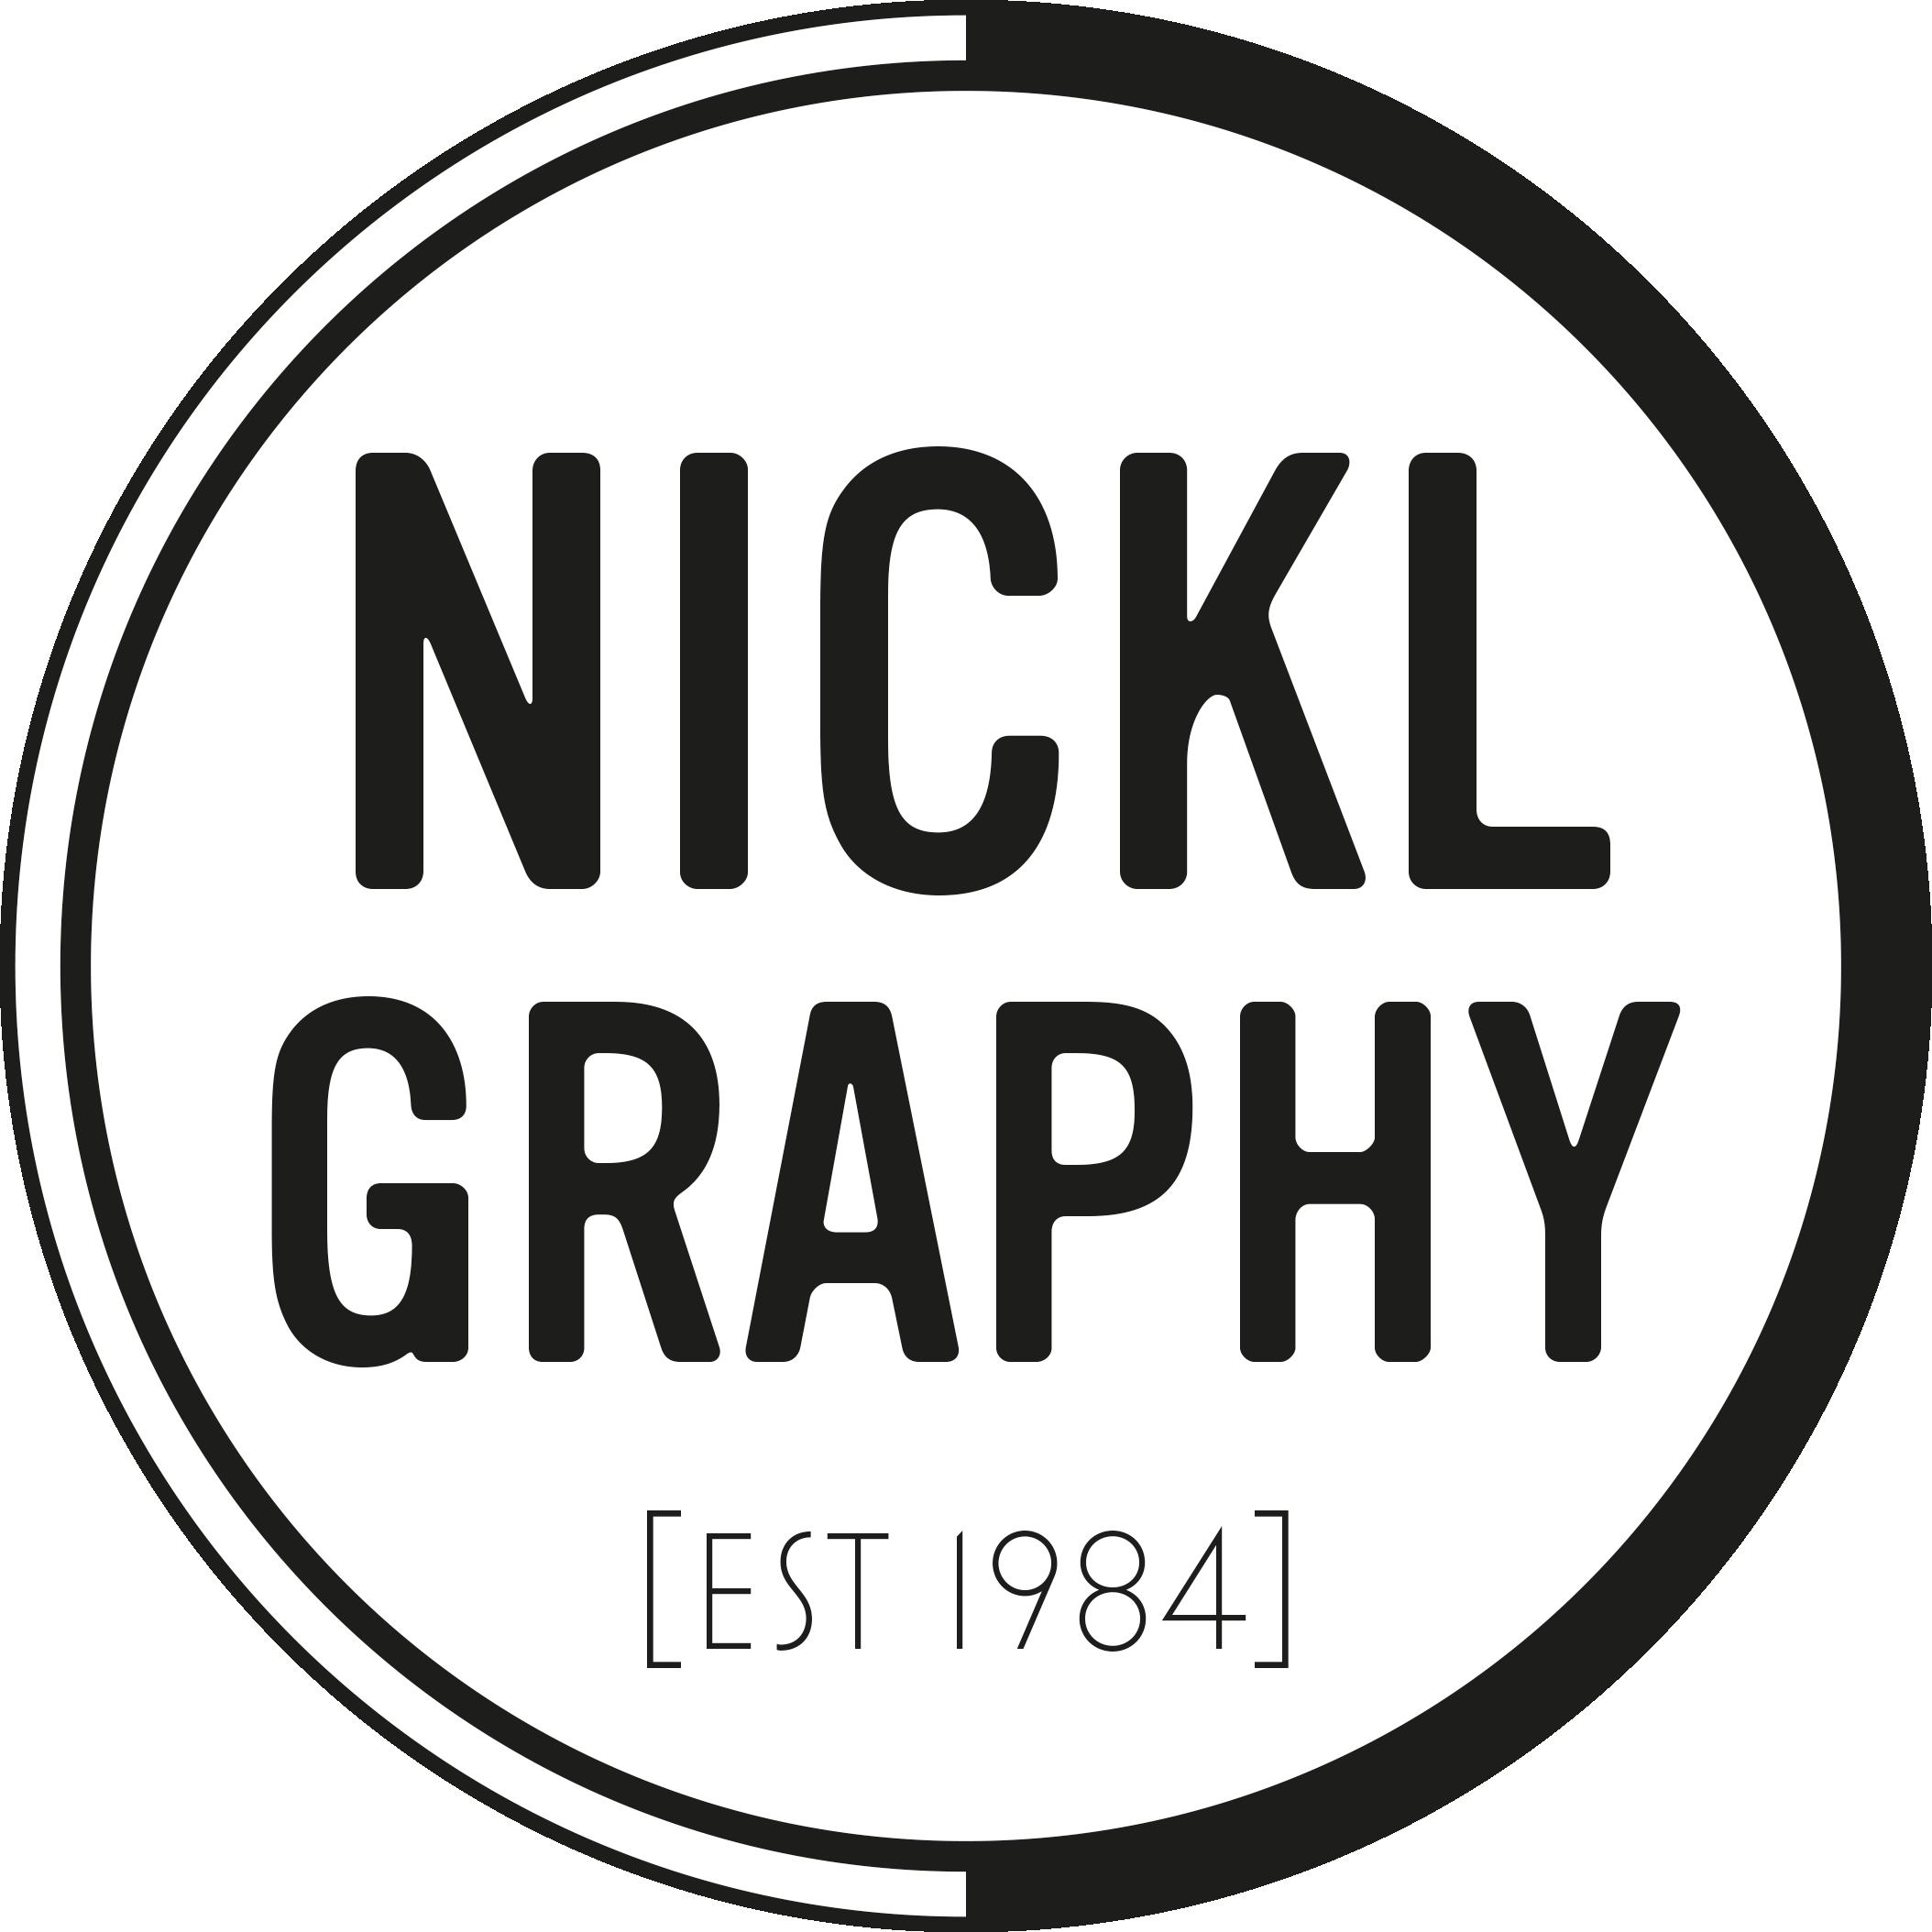 Nicklgraphy